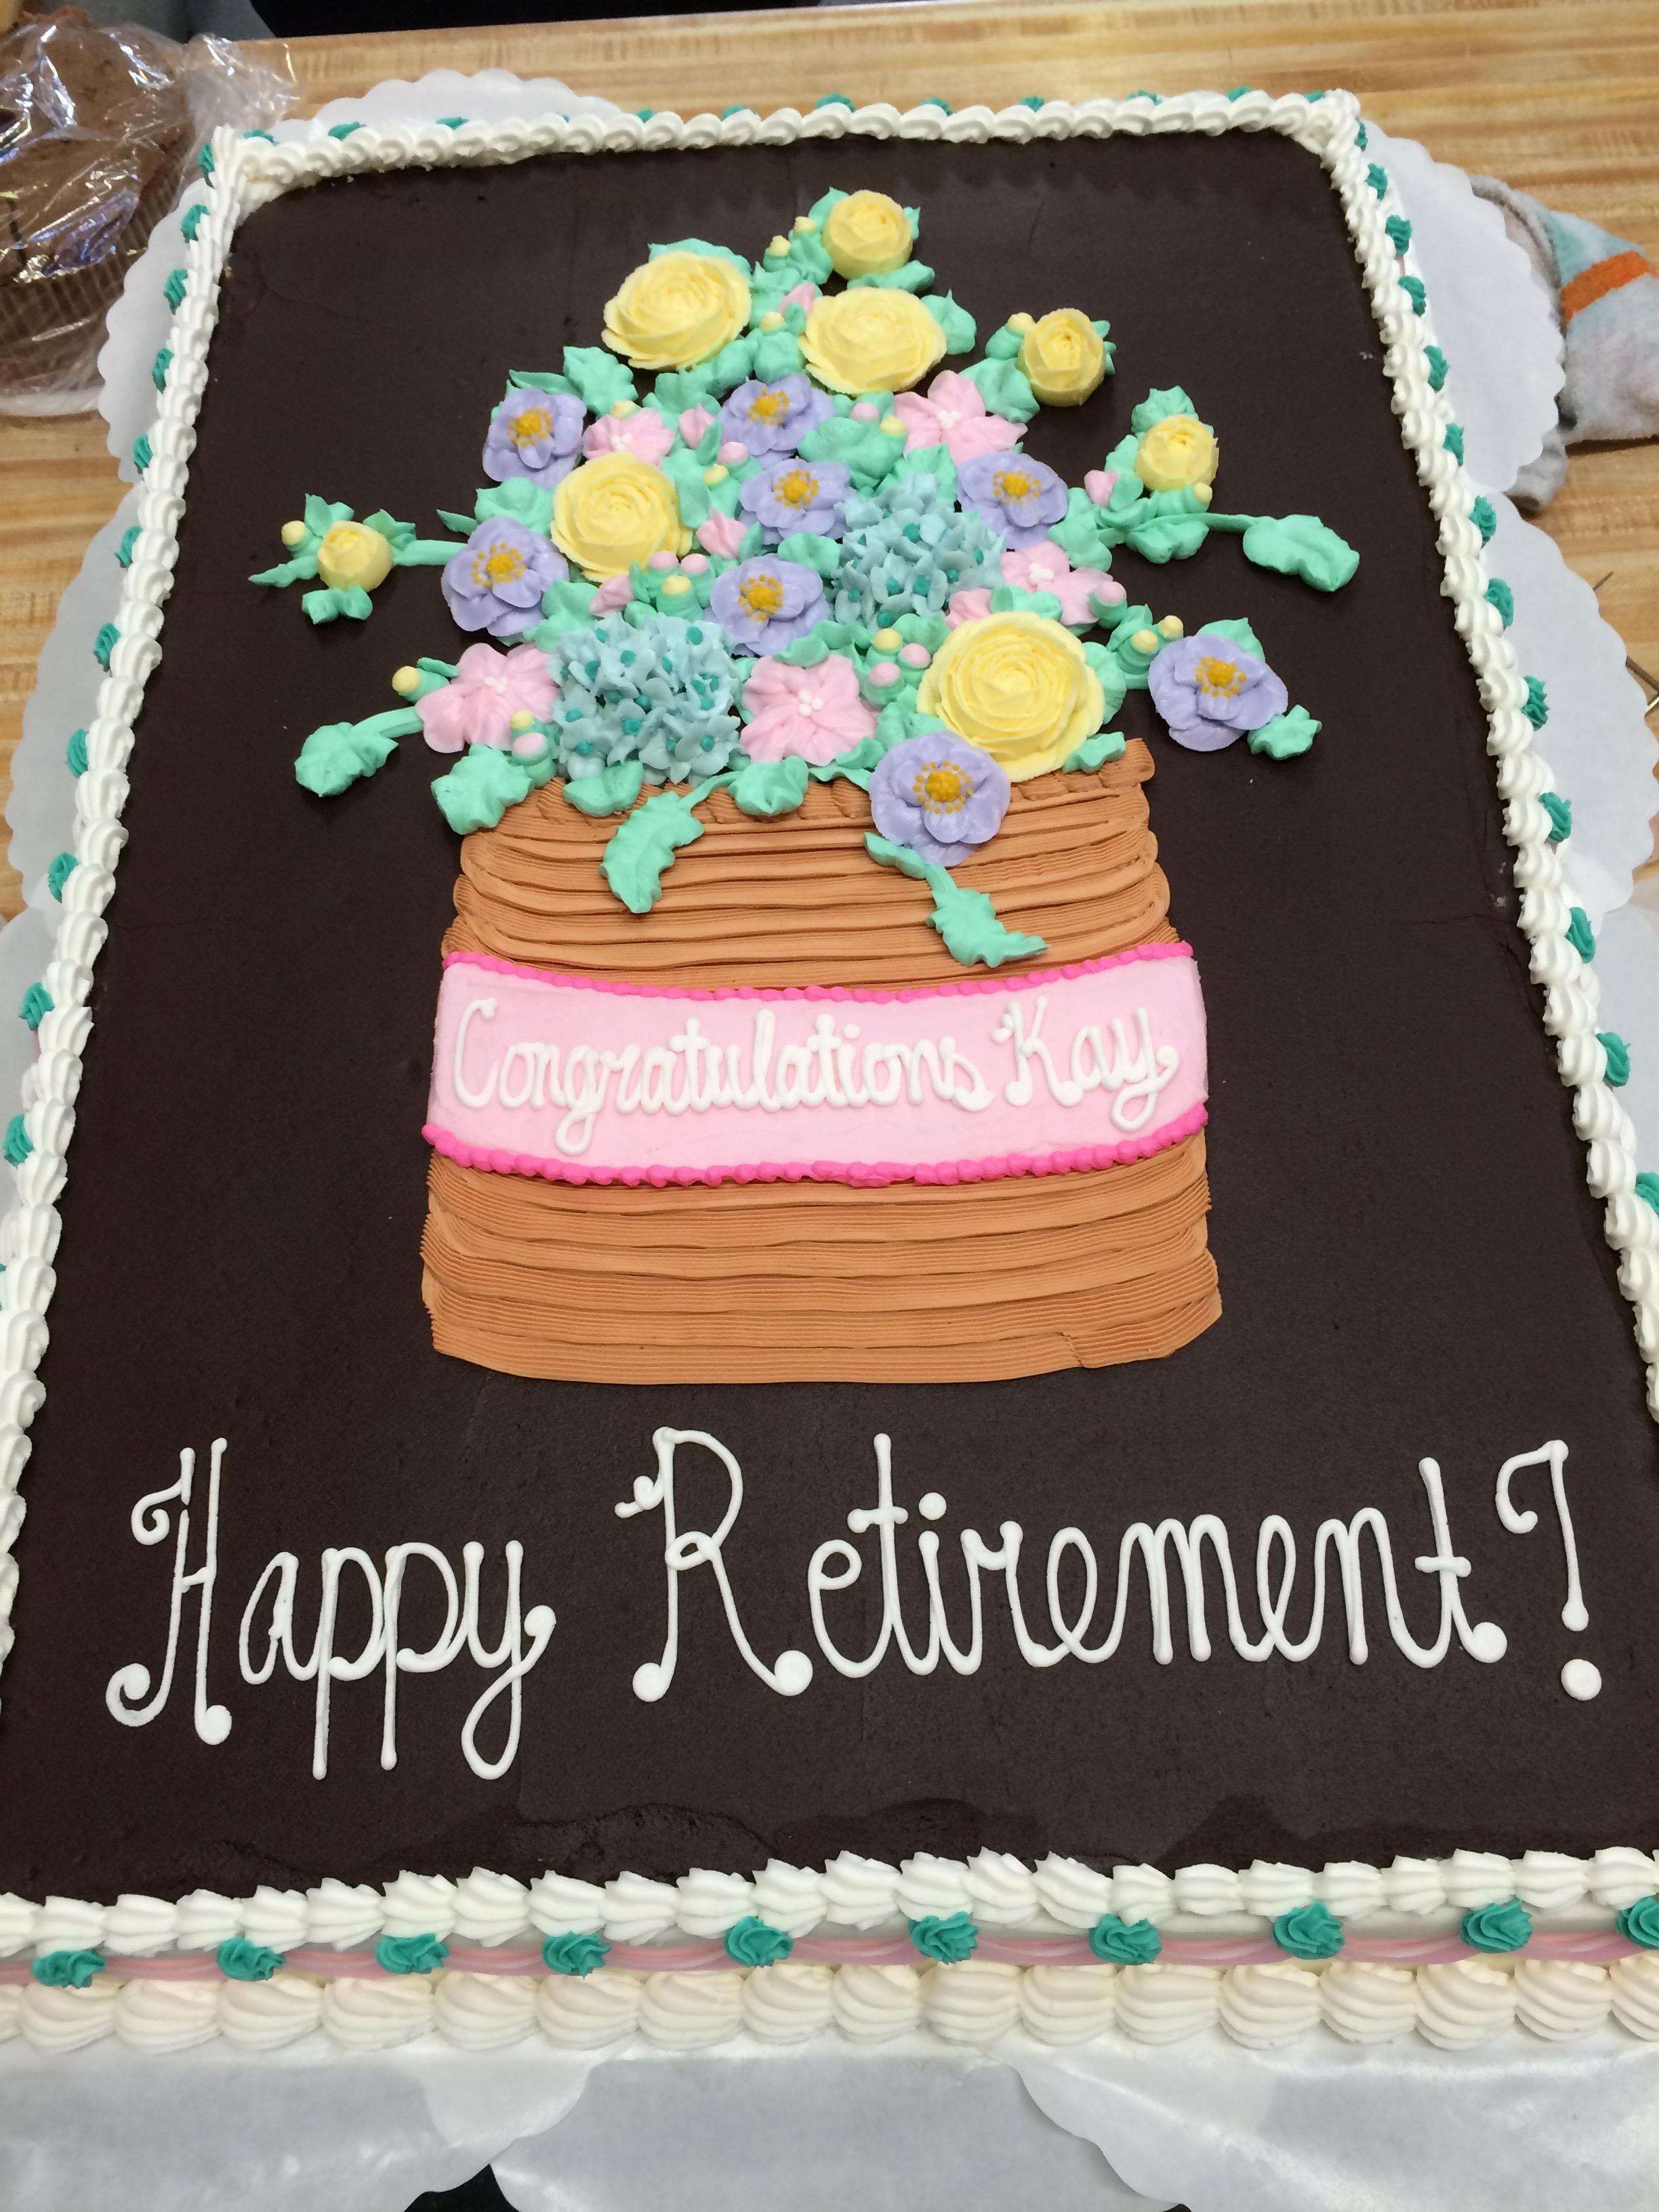 Retirement Cake w/ Pink Flowers 18